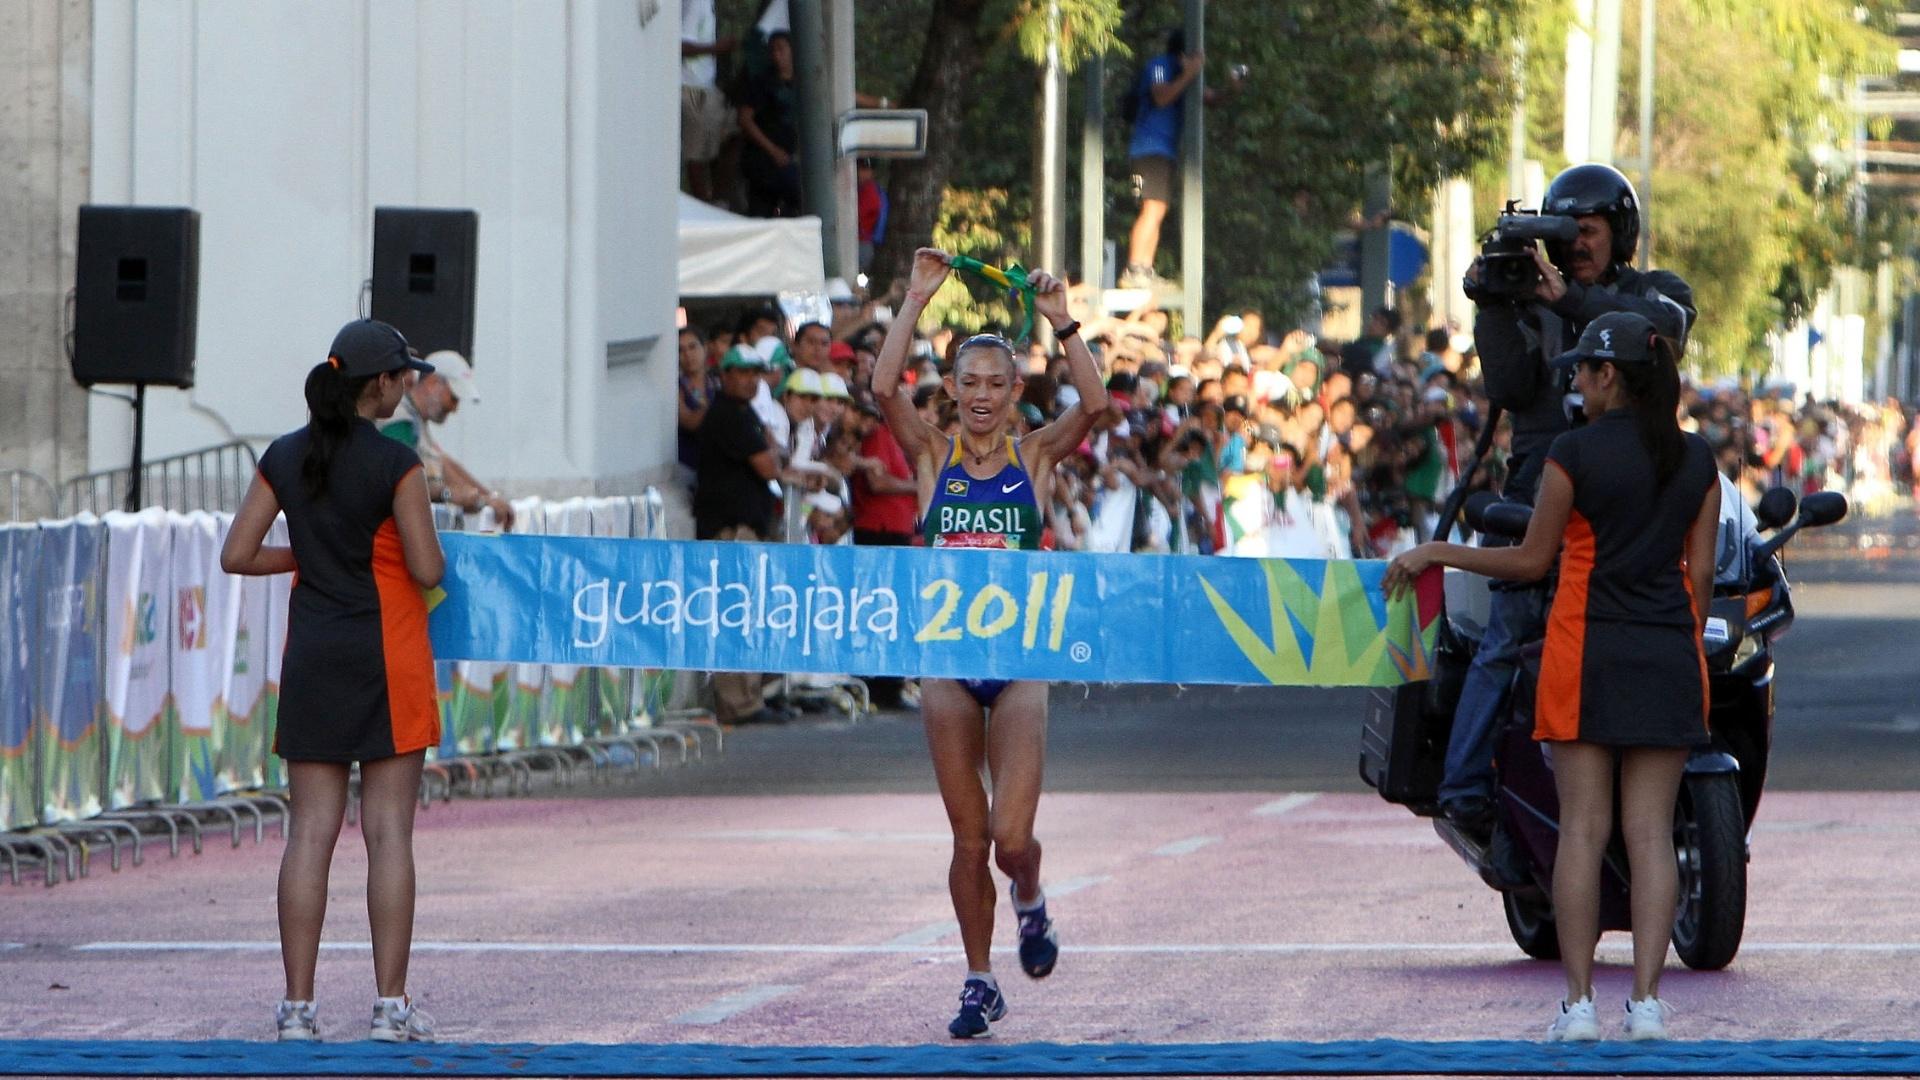 Adriana Aparecida da Silva vence a maratona feminina e registra o novo recorde pan-americano